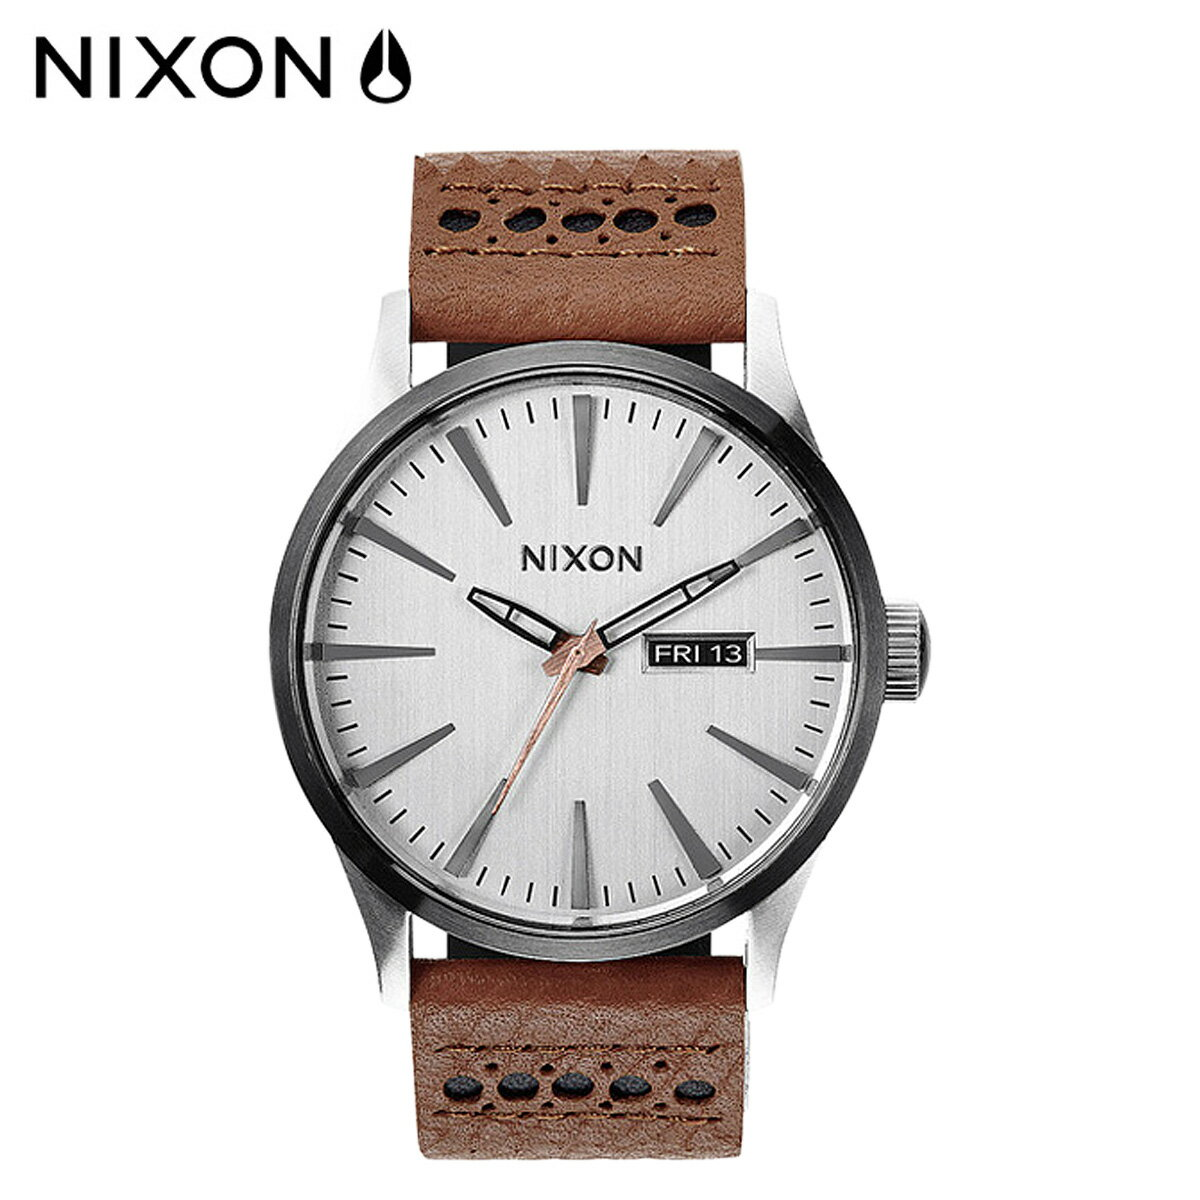 NIXON ニクソン 腕時計 時計 42mm A105 SENTRY LEATHER メンズ